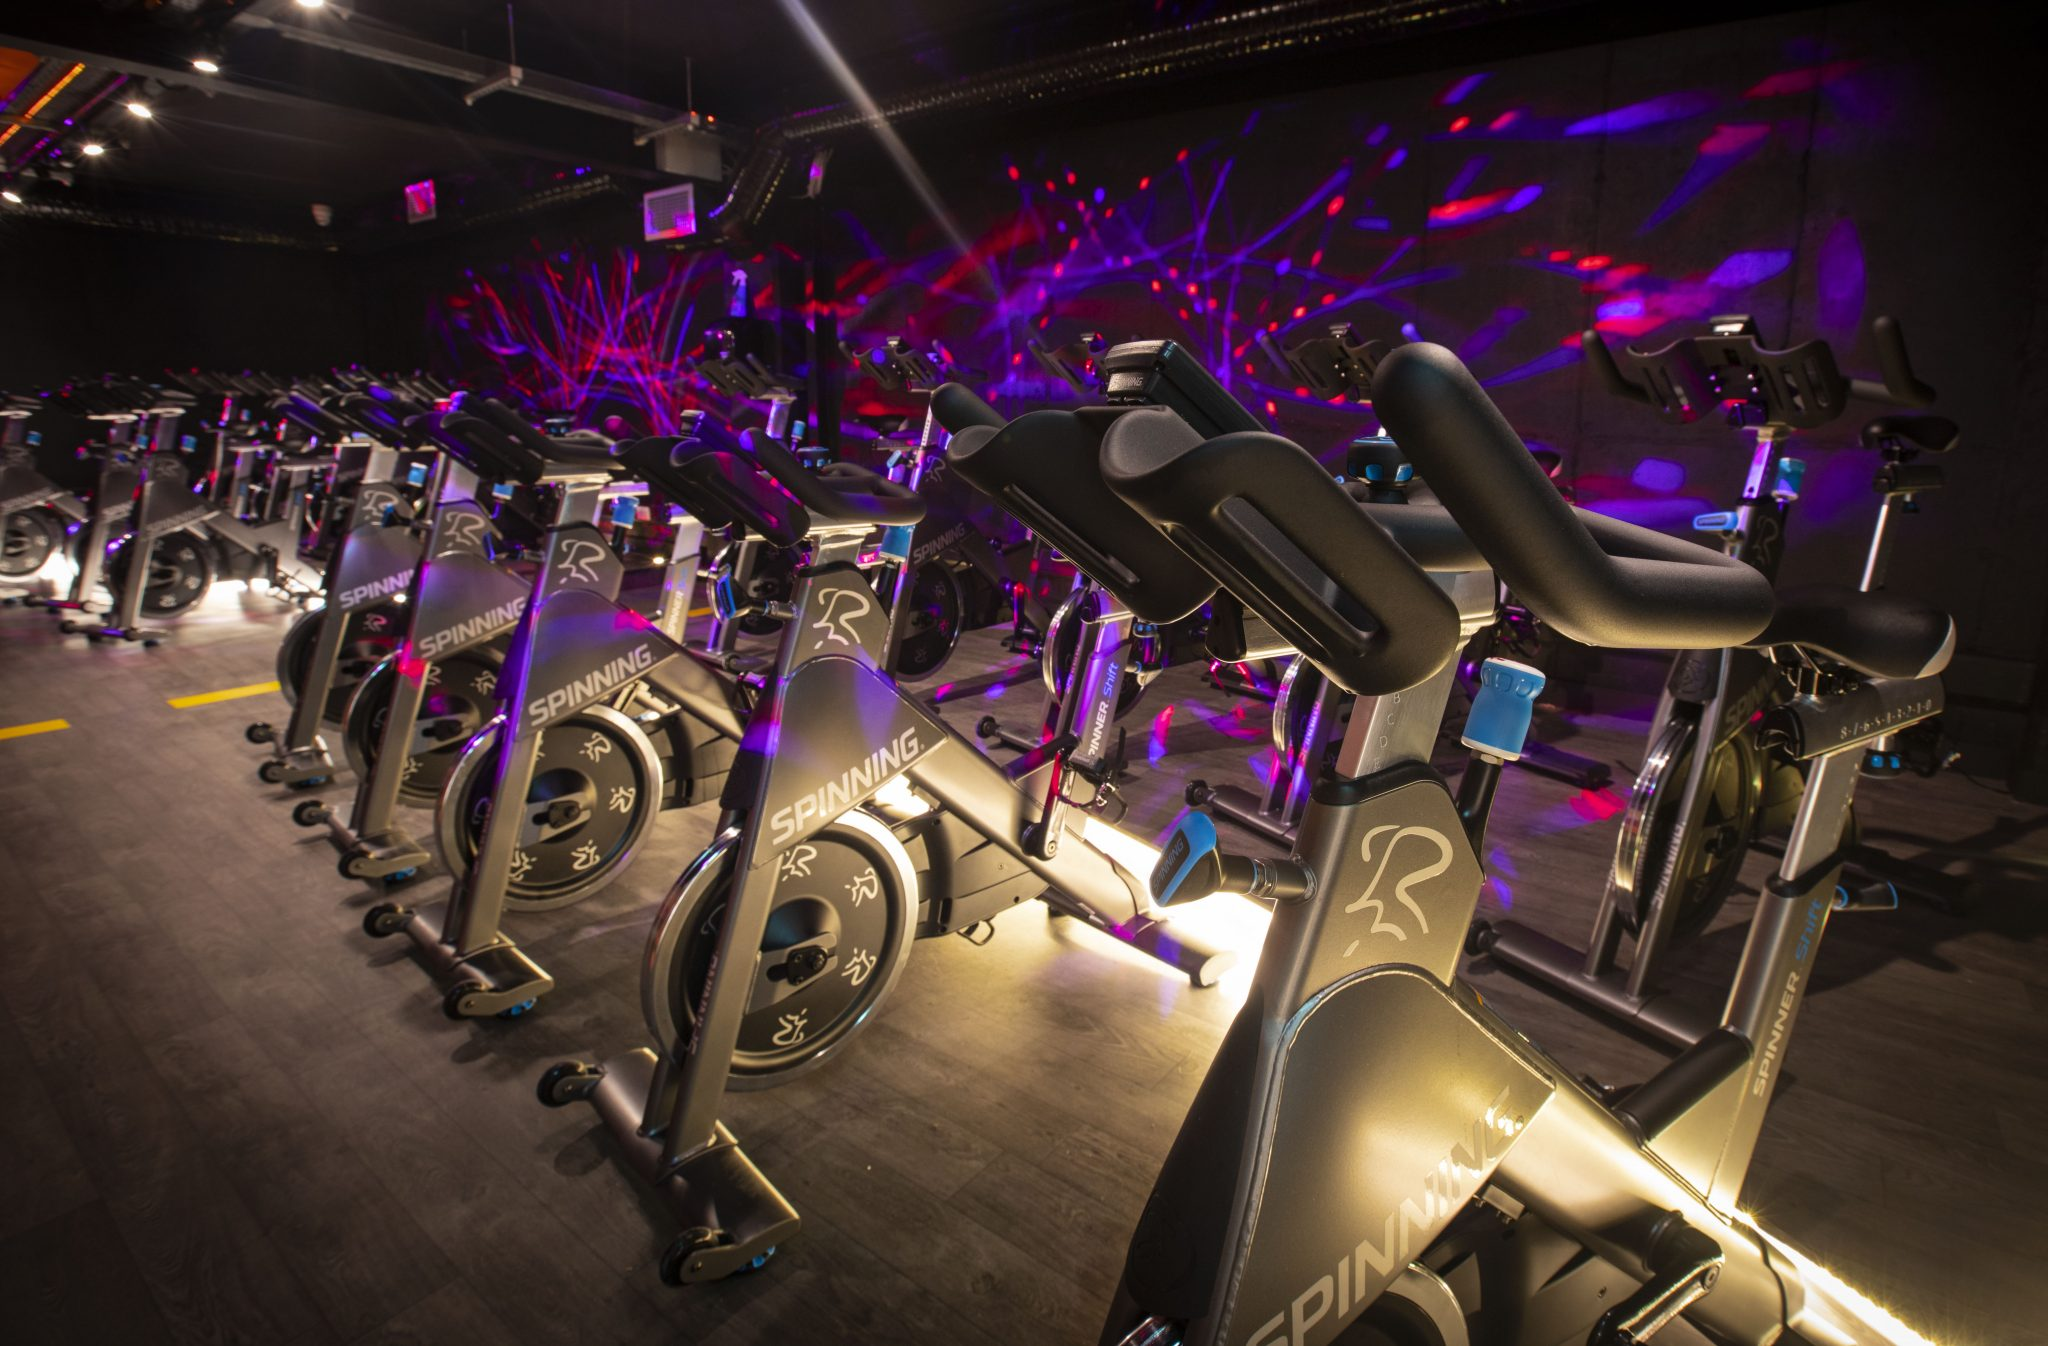 Treadmills – Clayton hotel